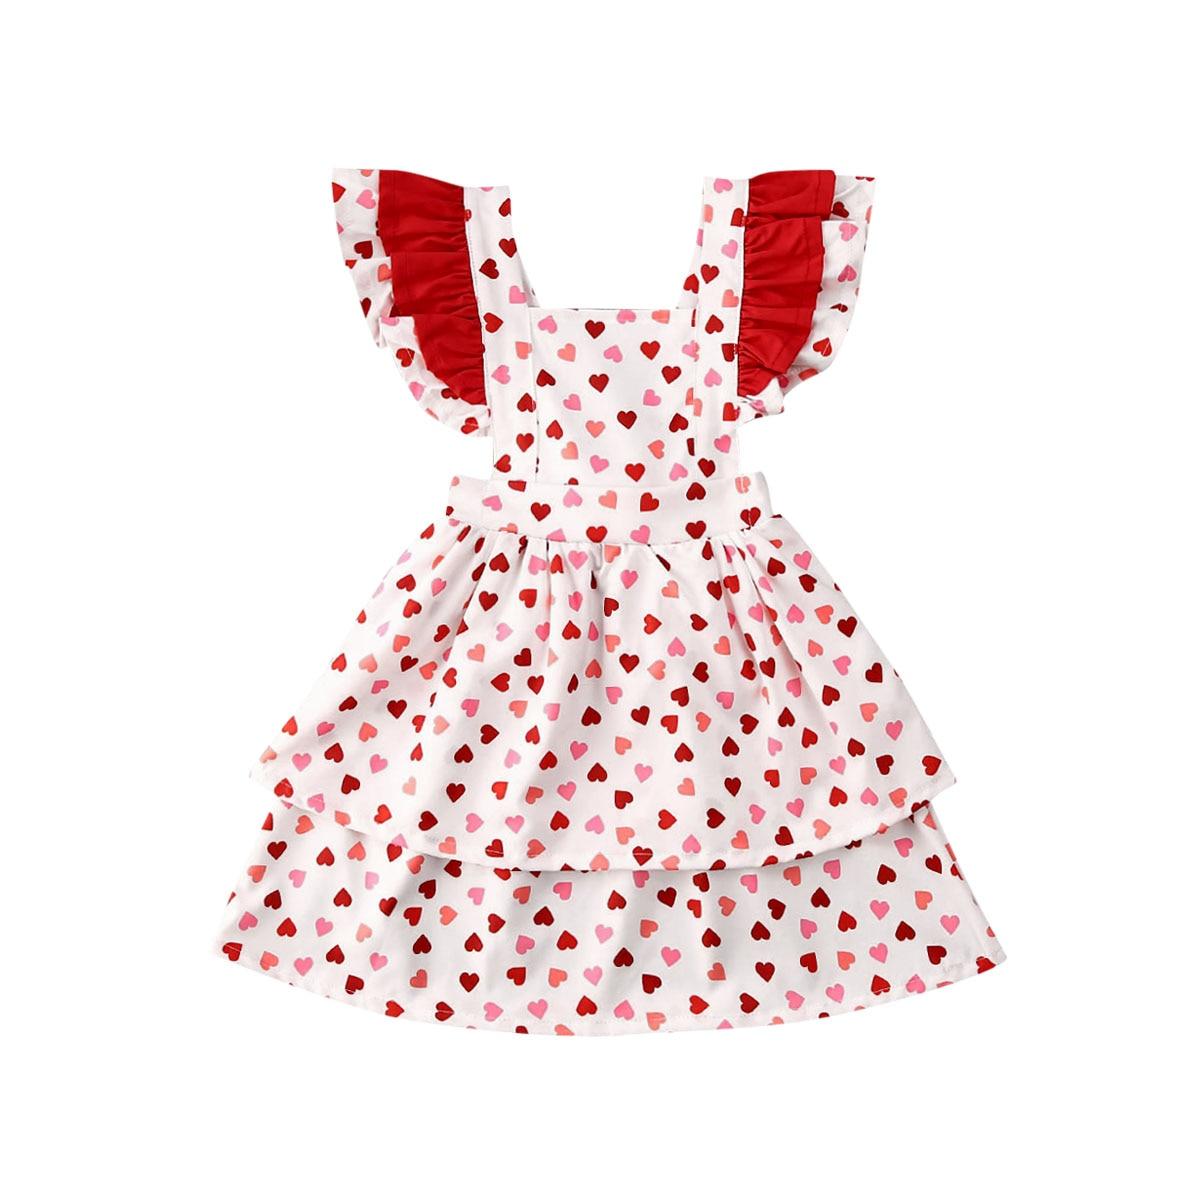 2020 chico bebé chica vestido de San Valentín ropa volantes manga impresión Tutu de la longitud de la rodilla vestido de princesa